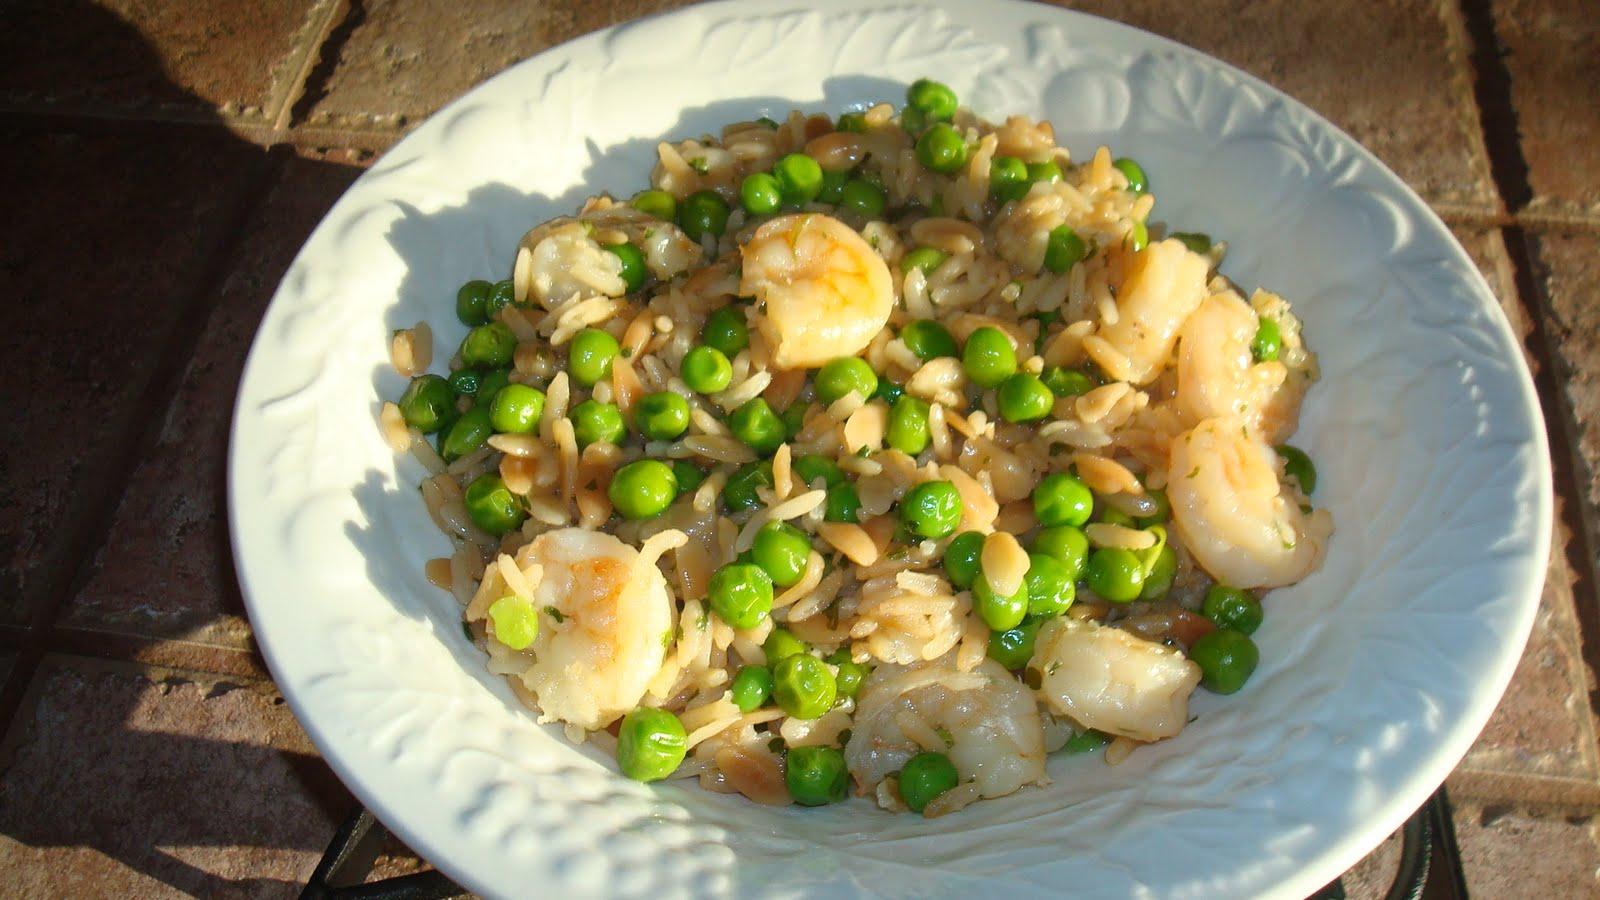 Fun Fierce Fabulous Beauty Over 50!: Cooking ~ Shrimp Peas & Rice